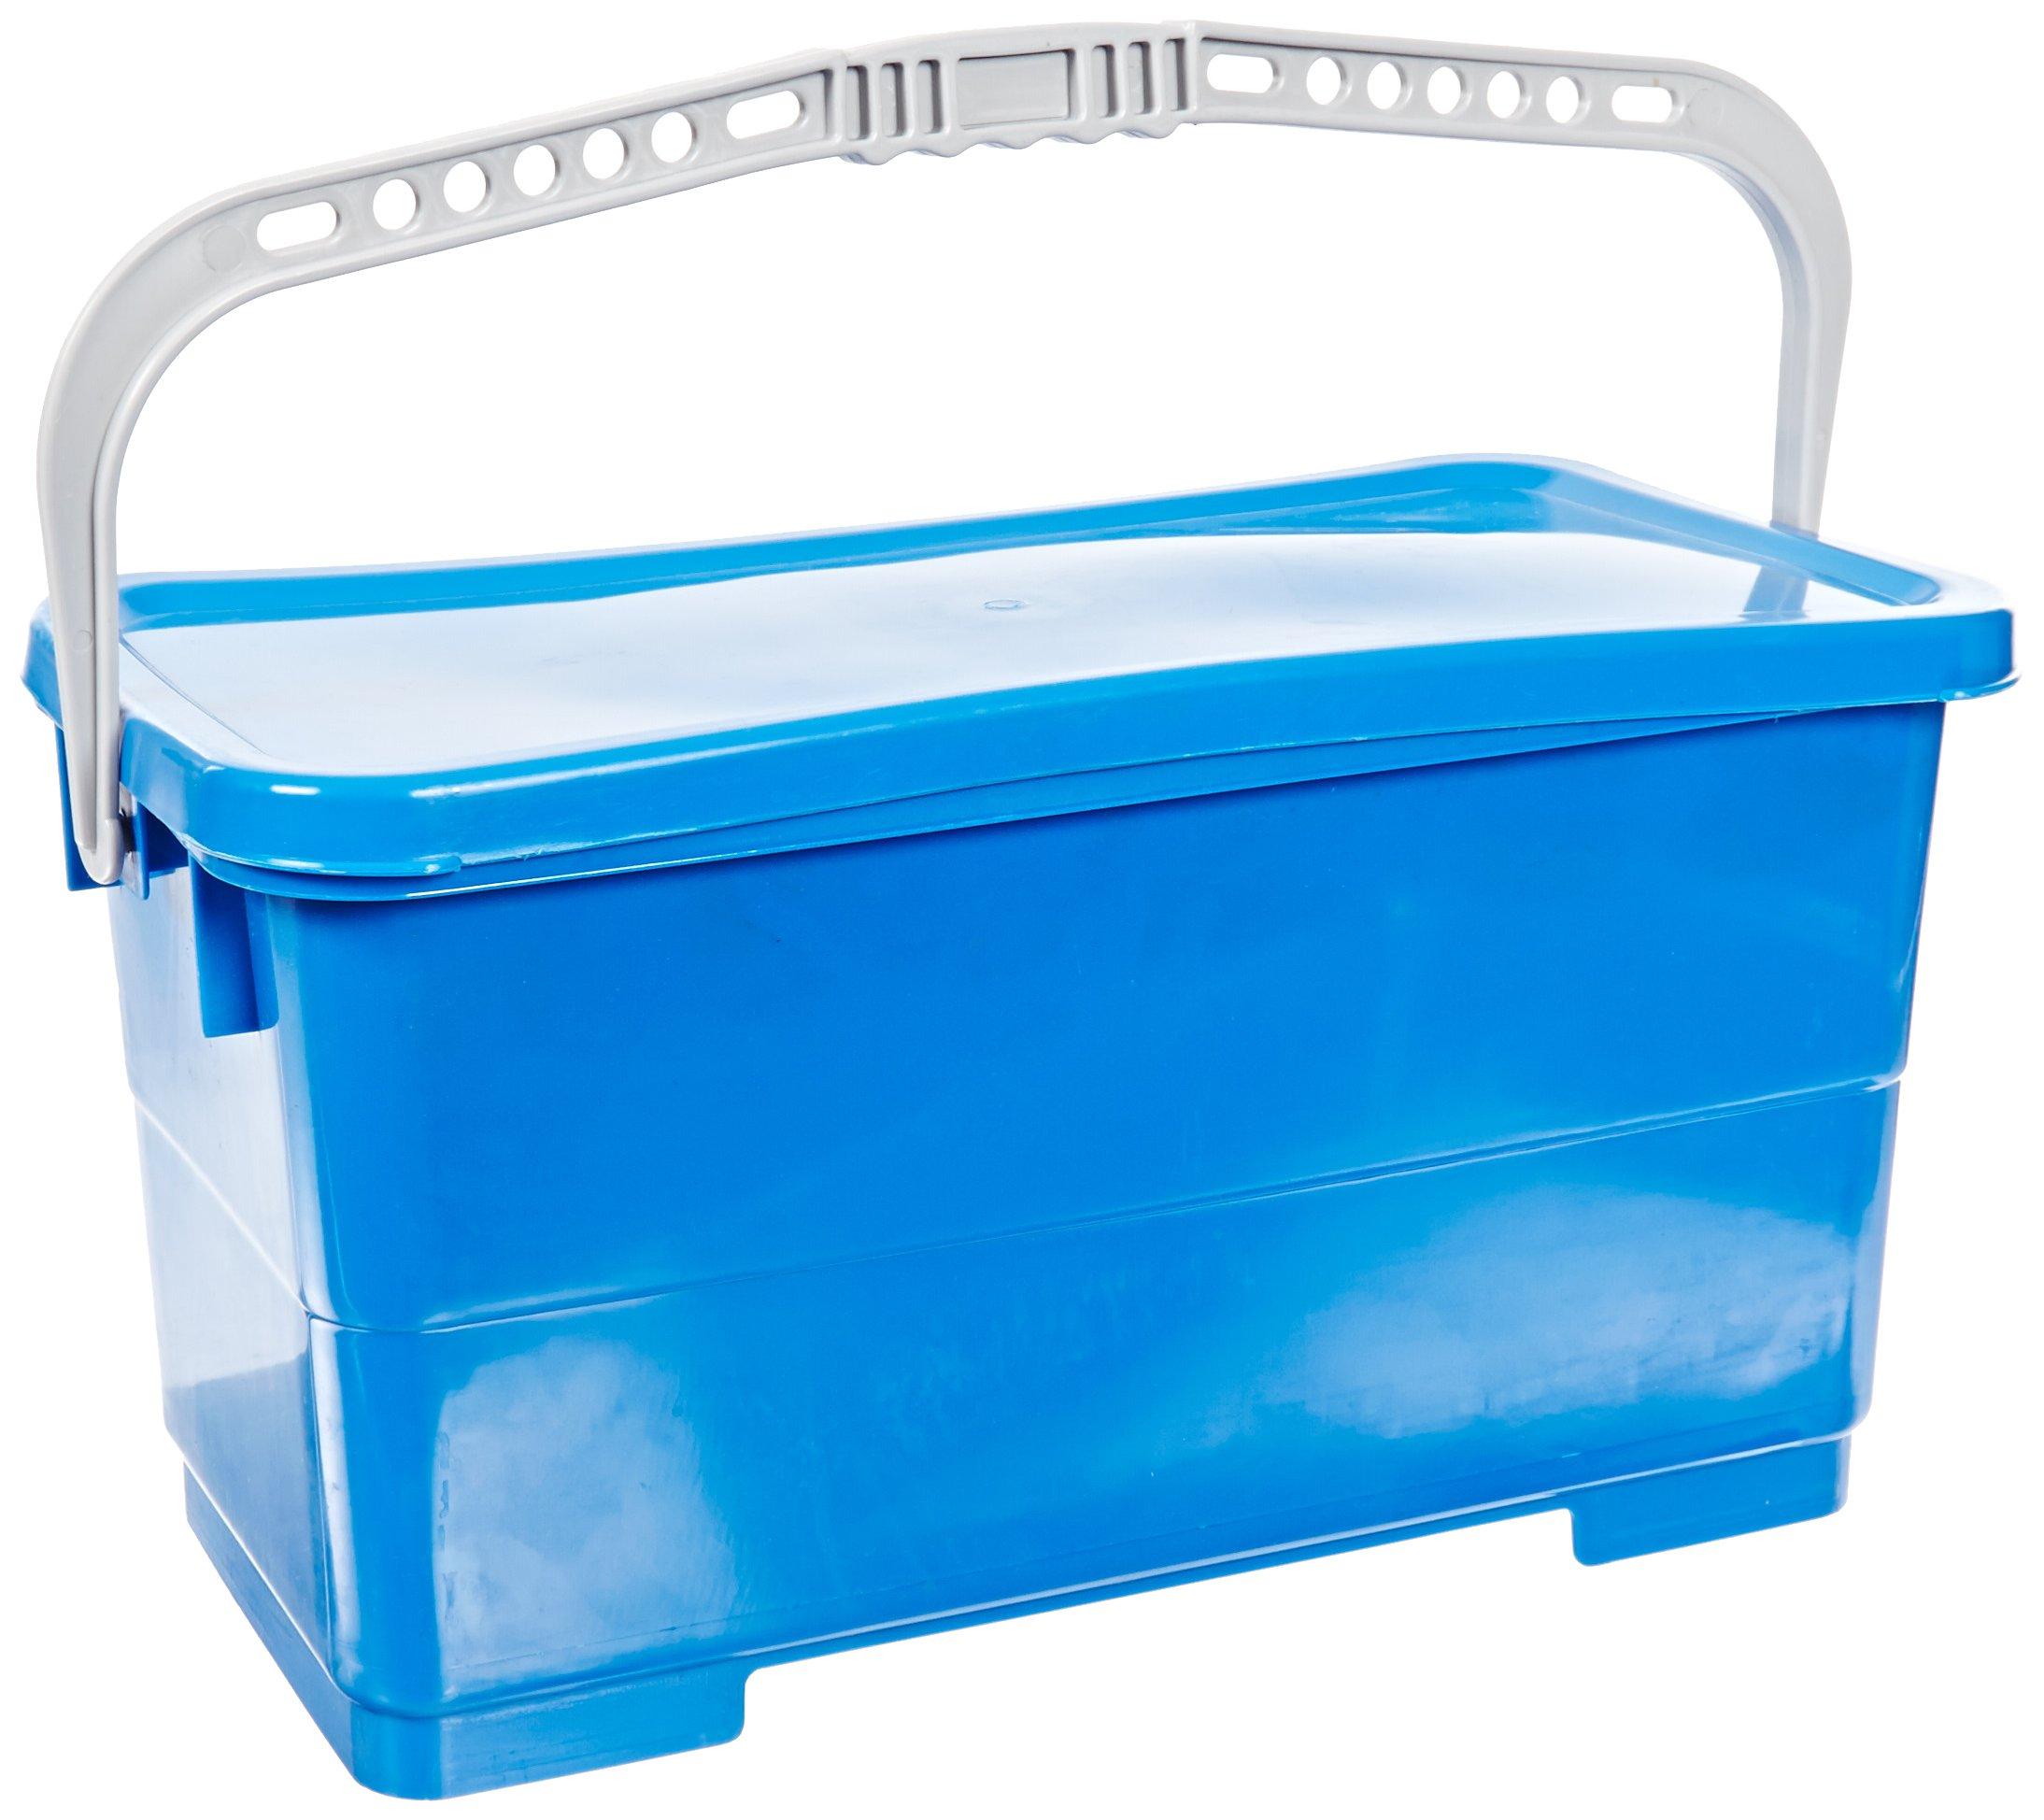 Impact LF328A Plastic Microfiber Top Down Charging Bucket, 5.25 Gallon Capacity, Blue (Case of 4)